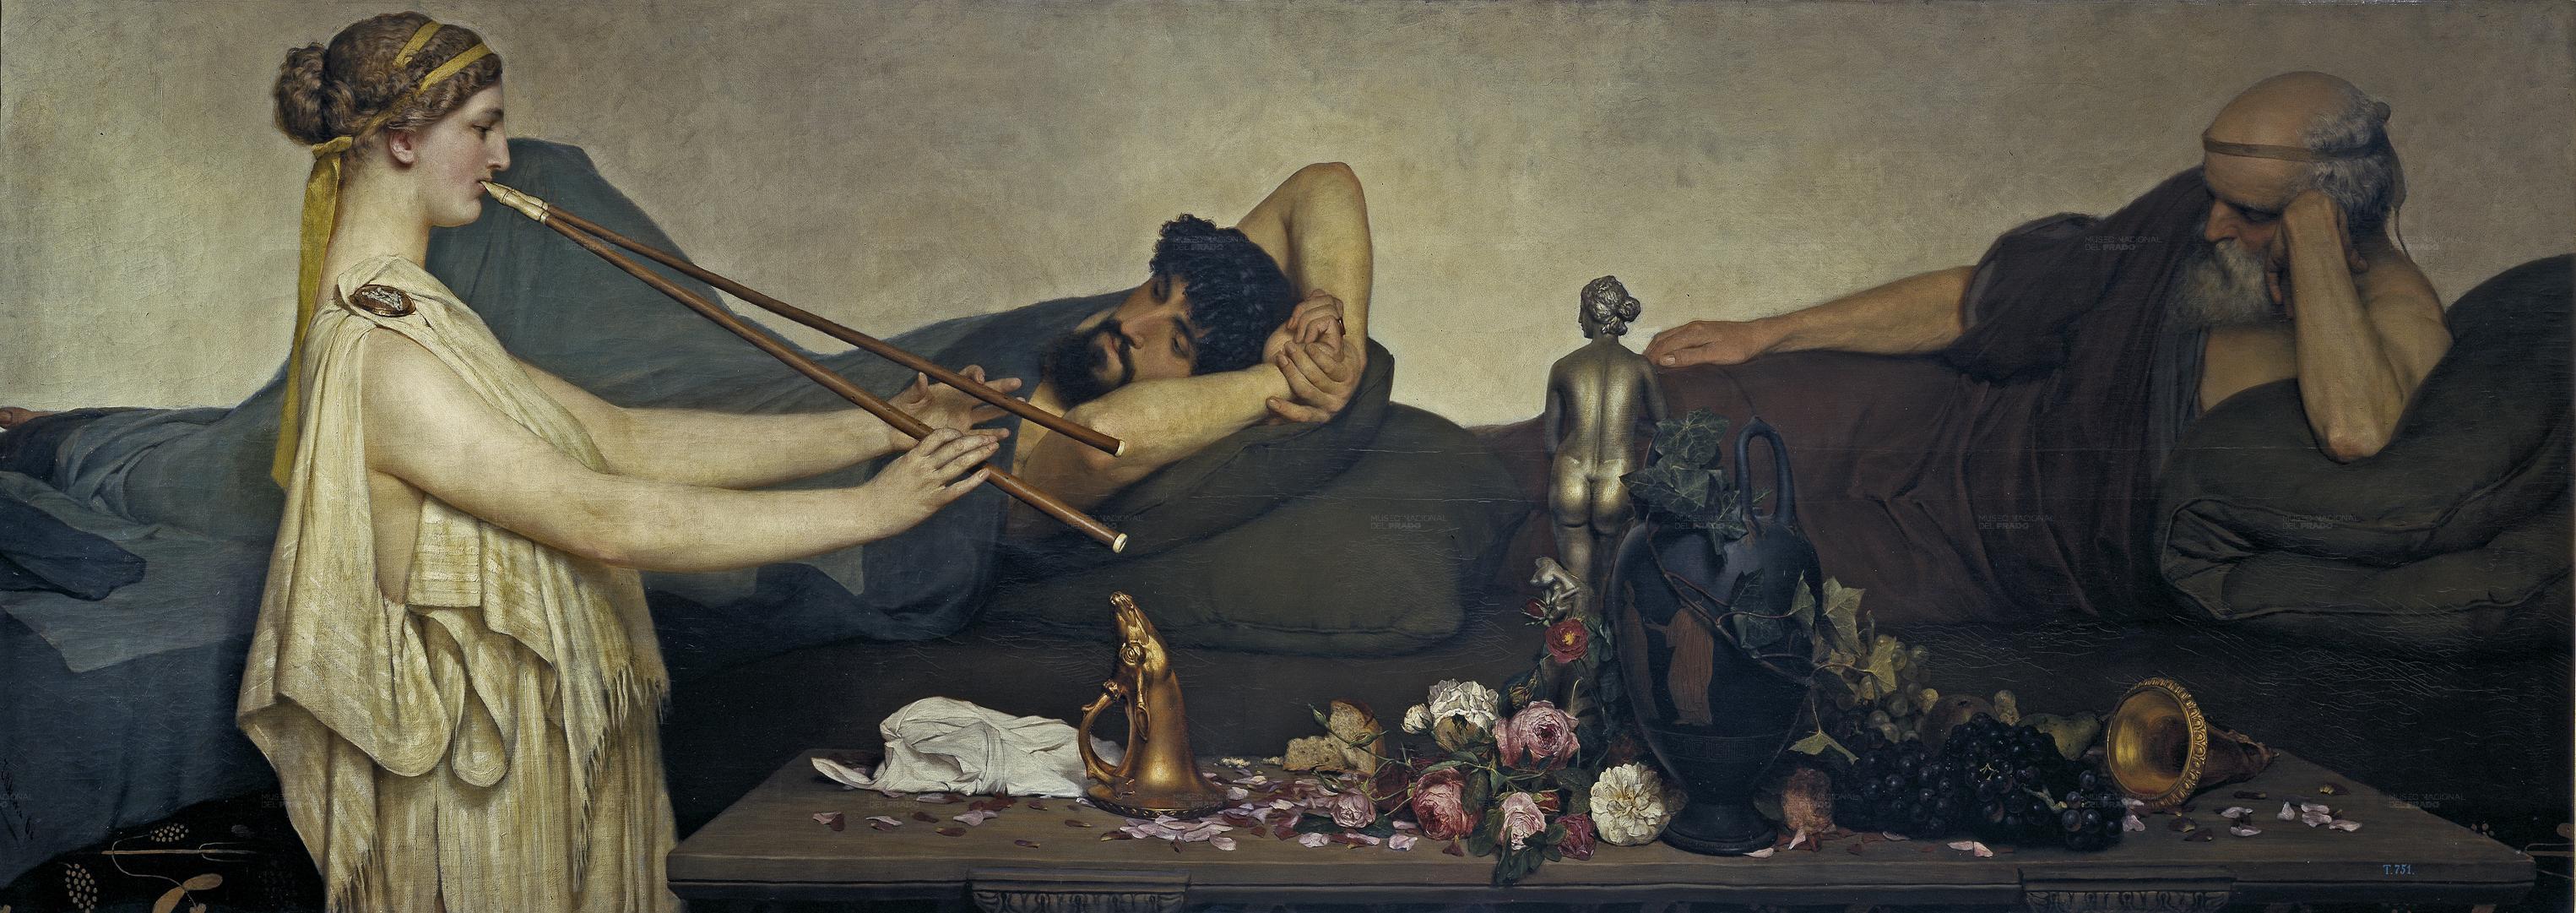 Pompeian Scene or The Siesta, 1868